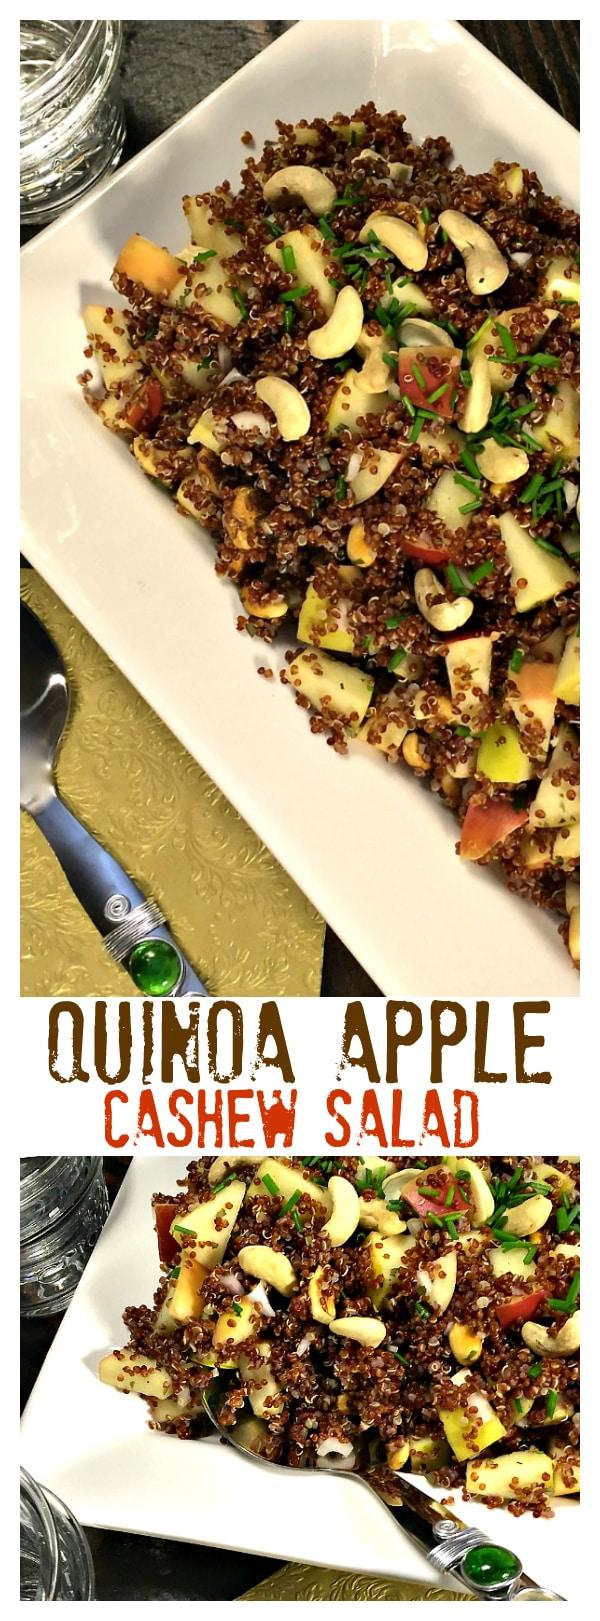 Quinoa Apple Cashew Salad